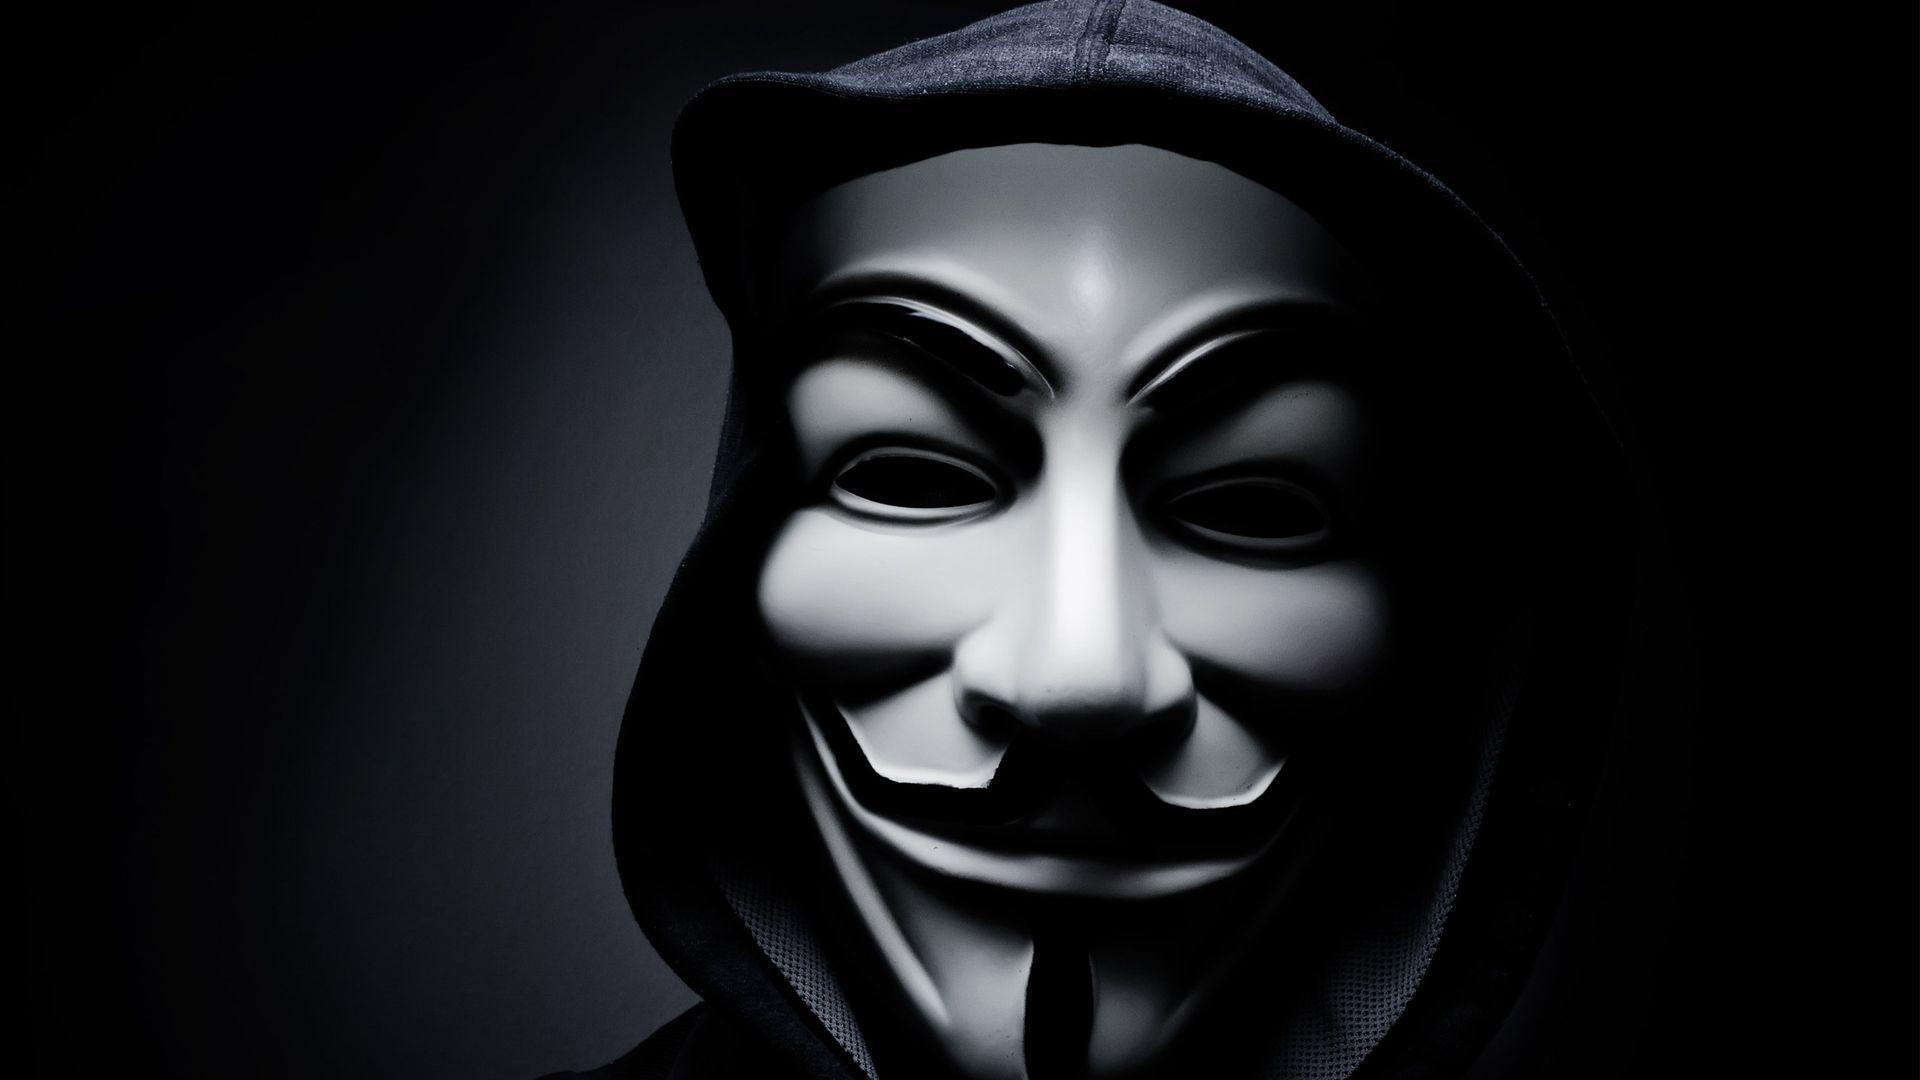 Hacker Mask Wallpapers Top Free Hacker Mask Backgrounds Wallpaperaccess